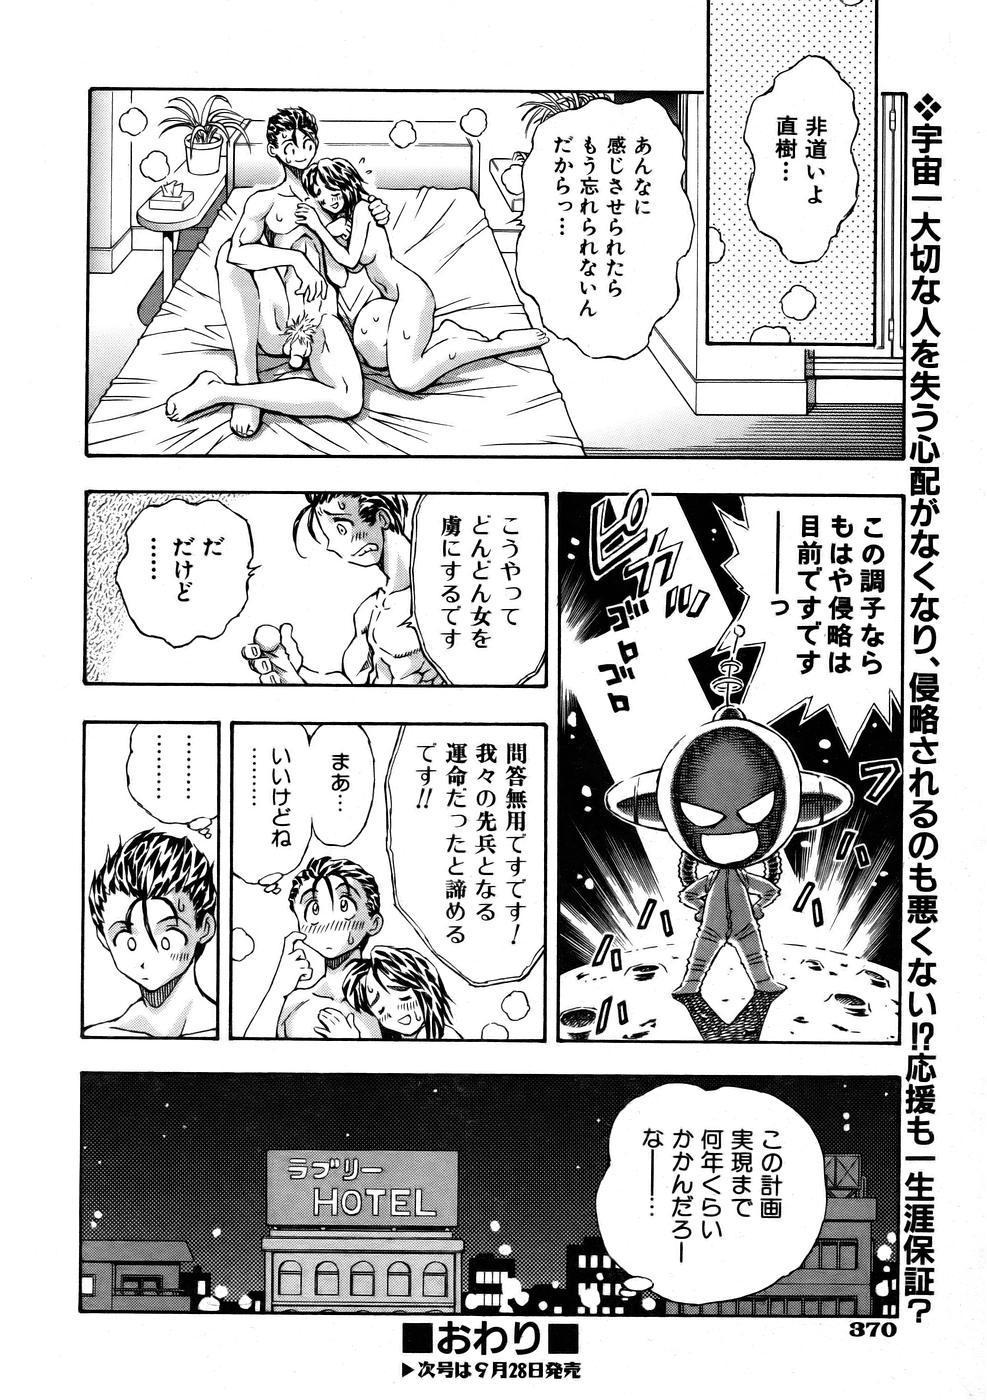 COMIC AUN 2005-10 Vol. 113 367